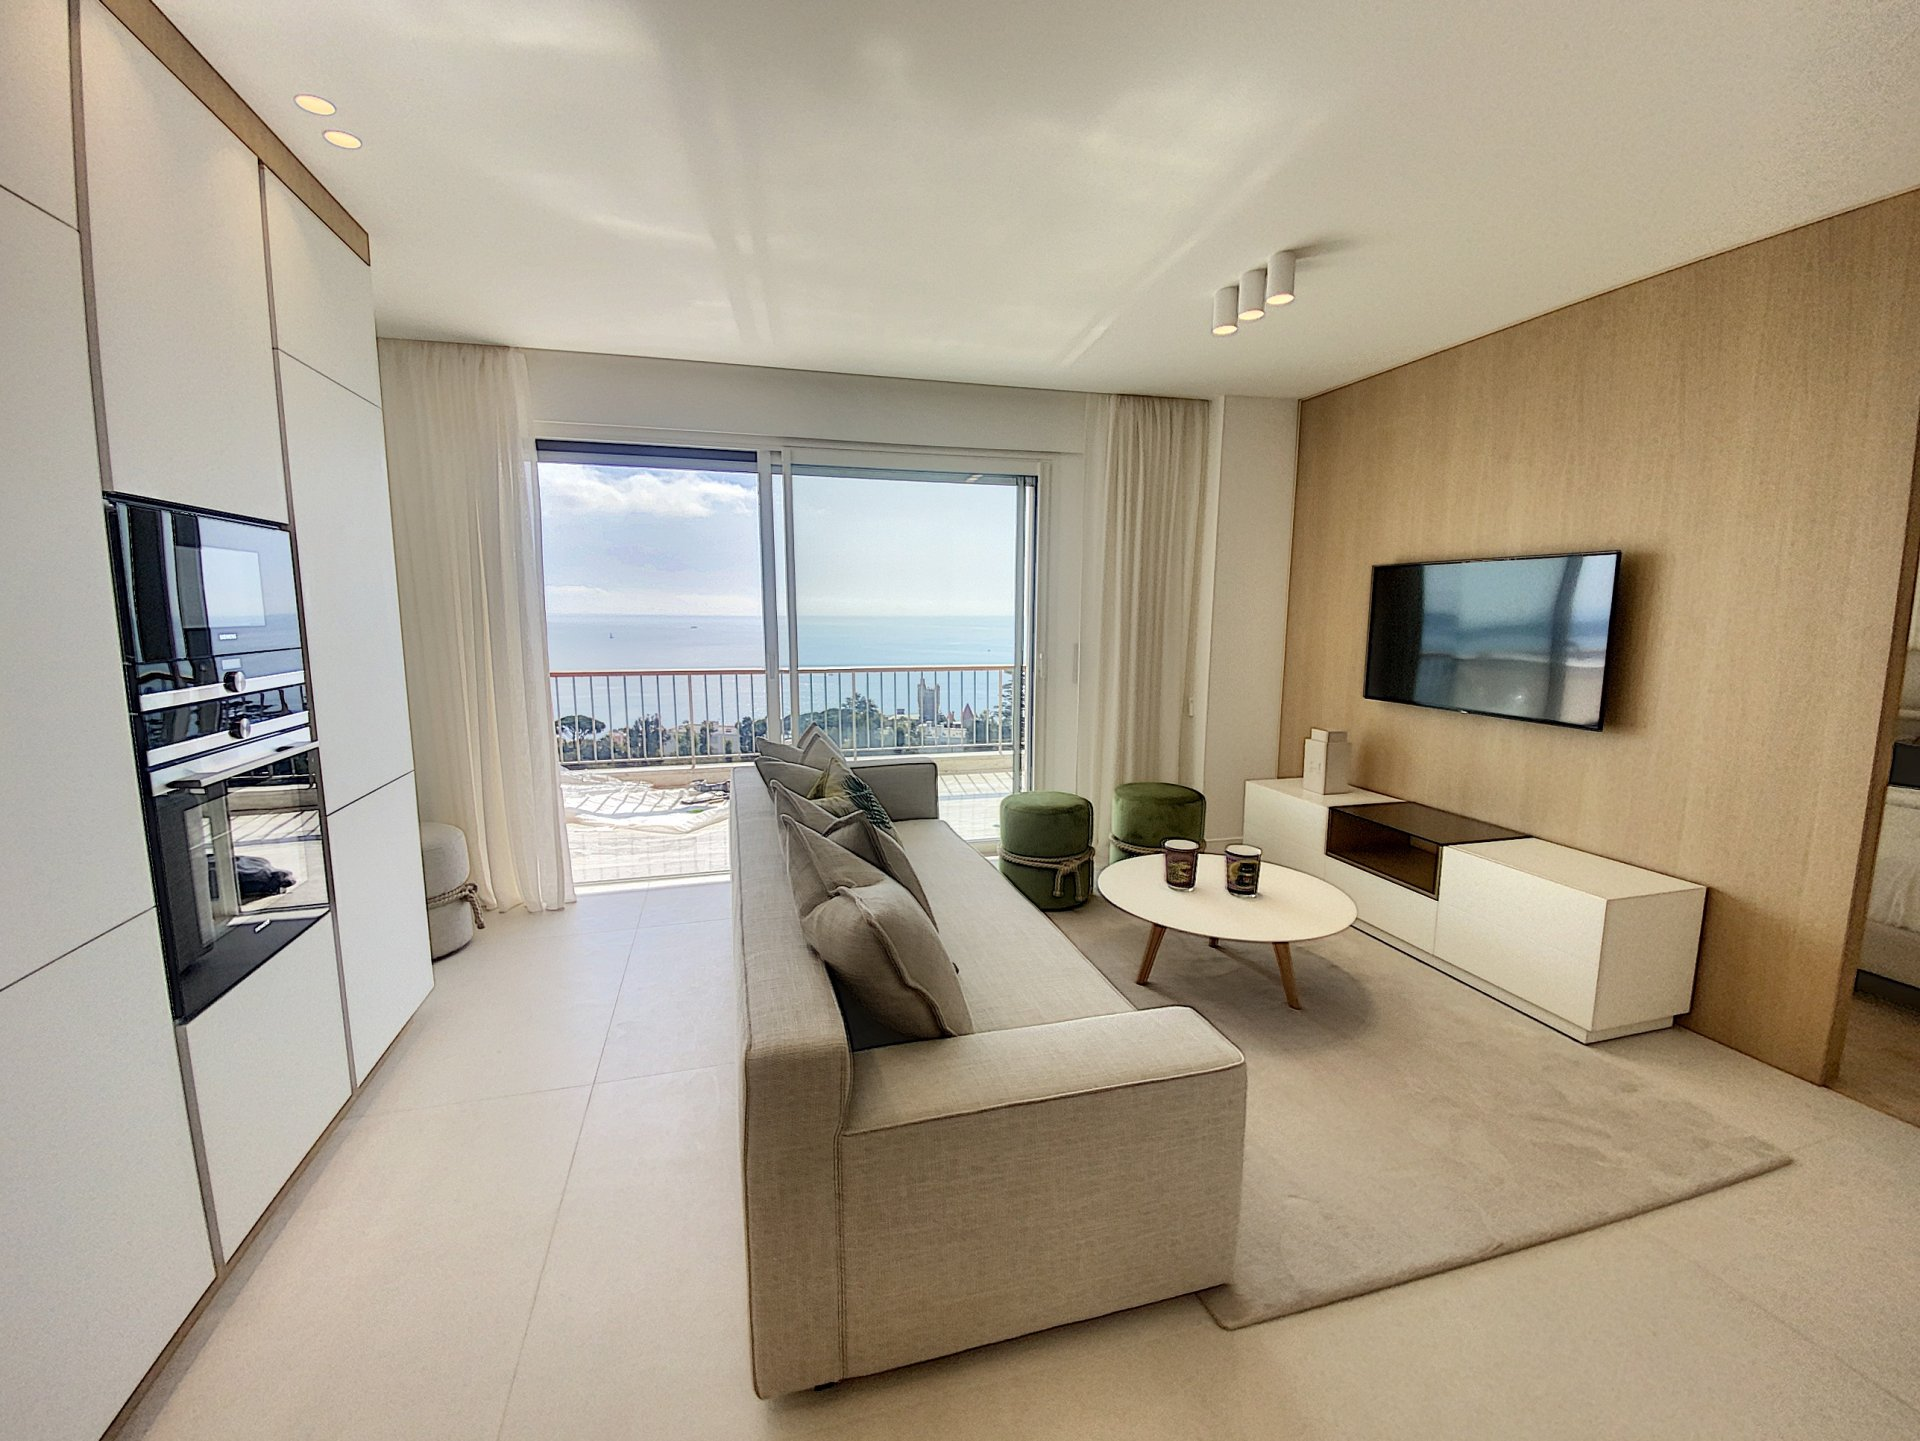 Cannes Californie 4P  92 m2 panoramic view